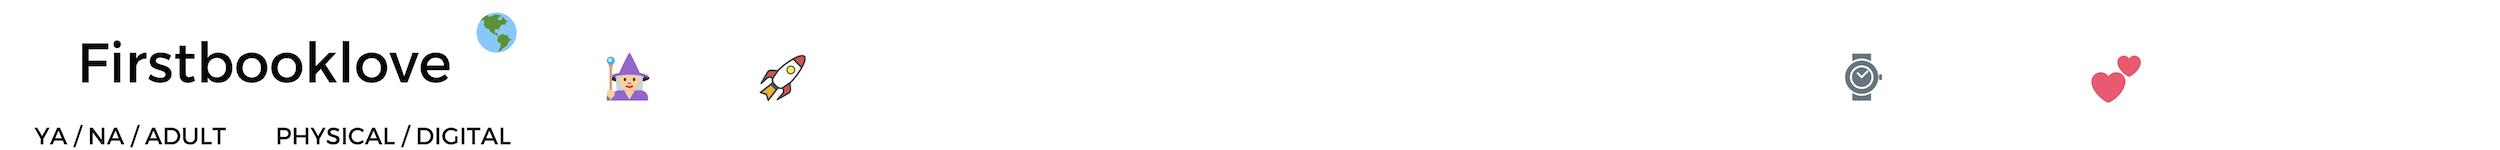 BOOK BLOG COMMUNITY _ BANNER + PROFILES [2500 x 150] (10).jpg